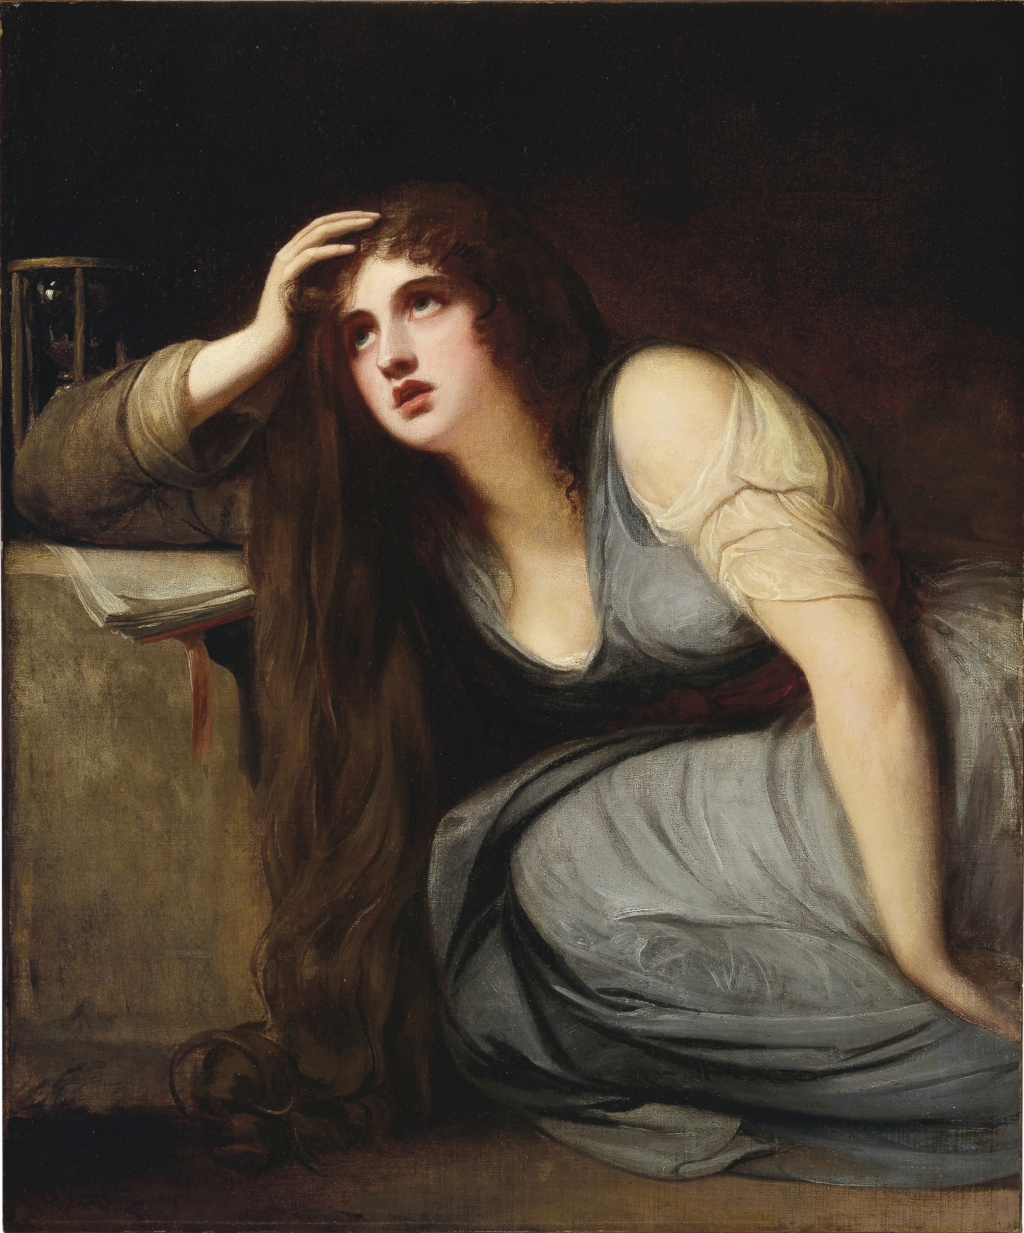 Emma Hart, Lady Hamilton, née Amy Lyons - Page 4 George22